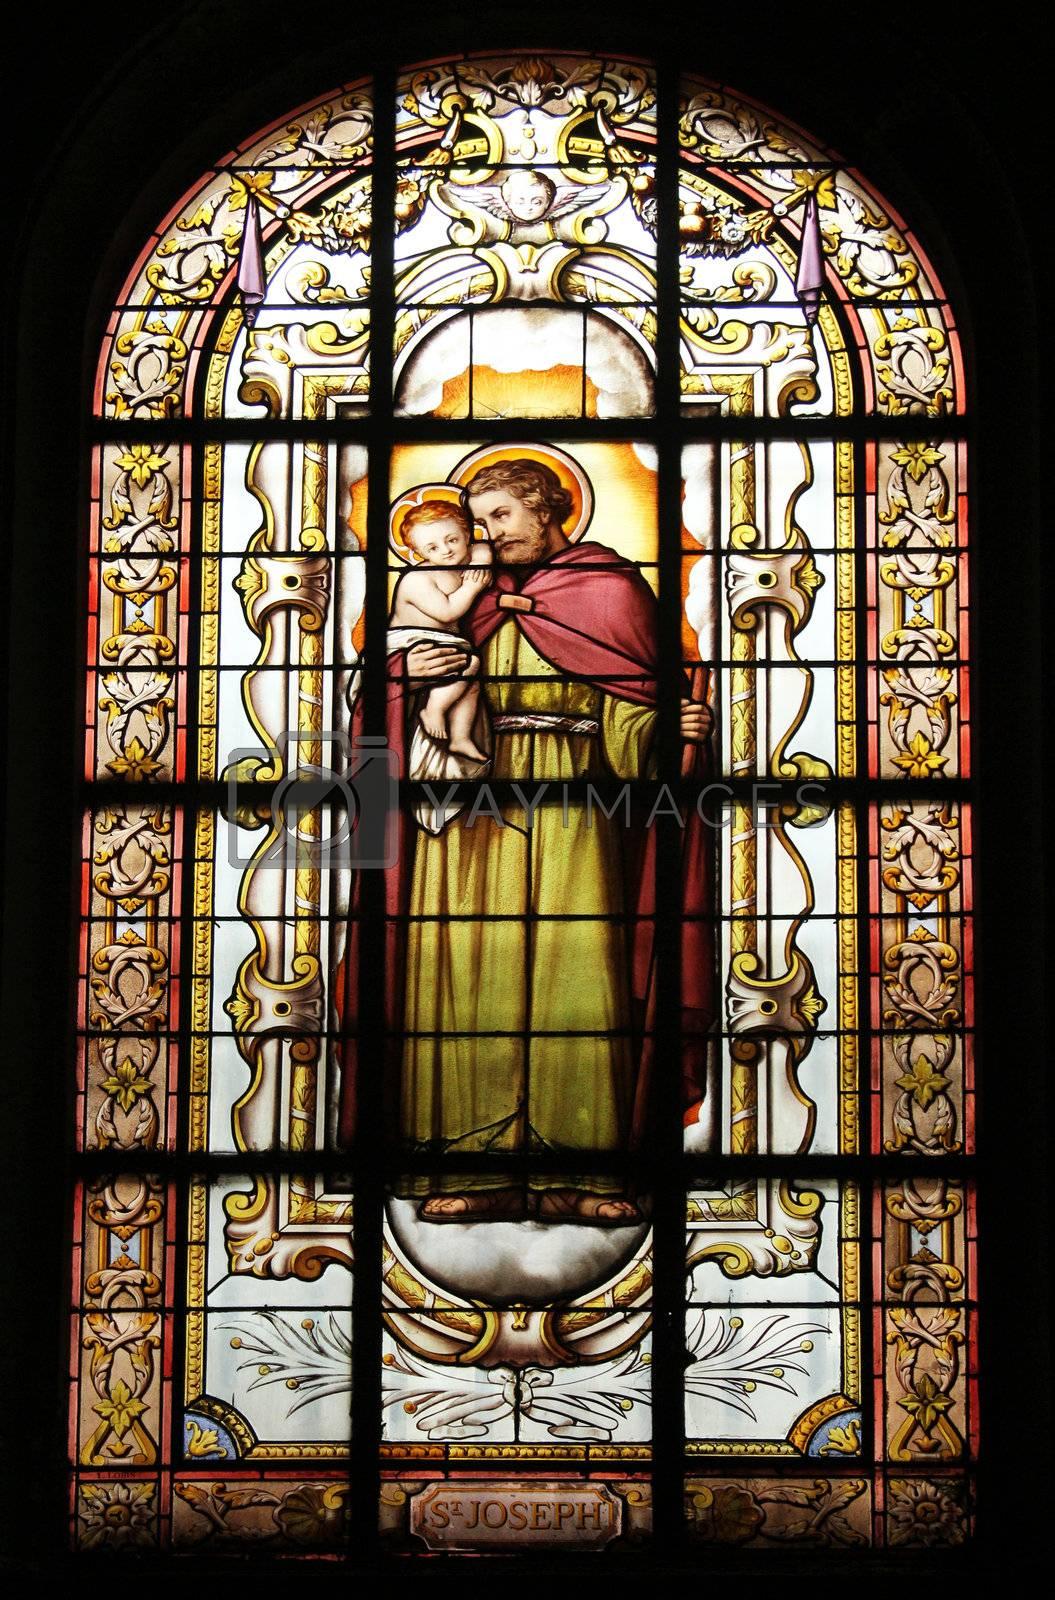 Saint Joseph holding baby Jesus, stained glass, St. Elizabeth of Hungary church, Paris